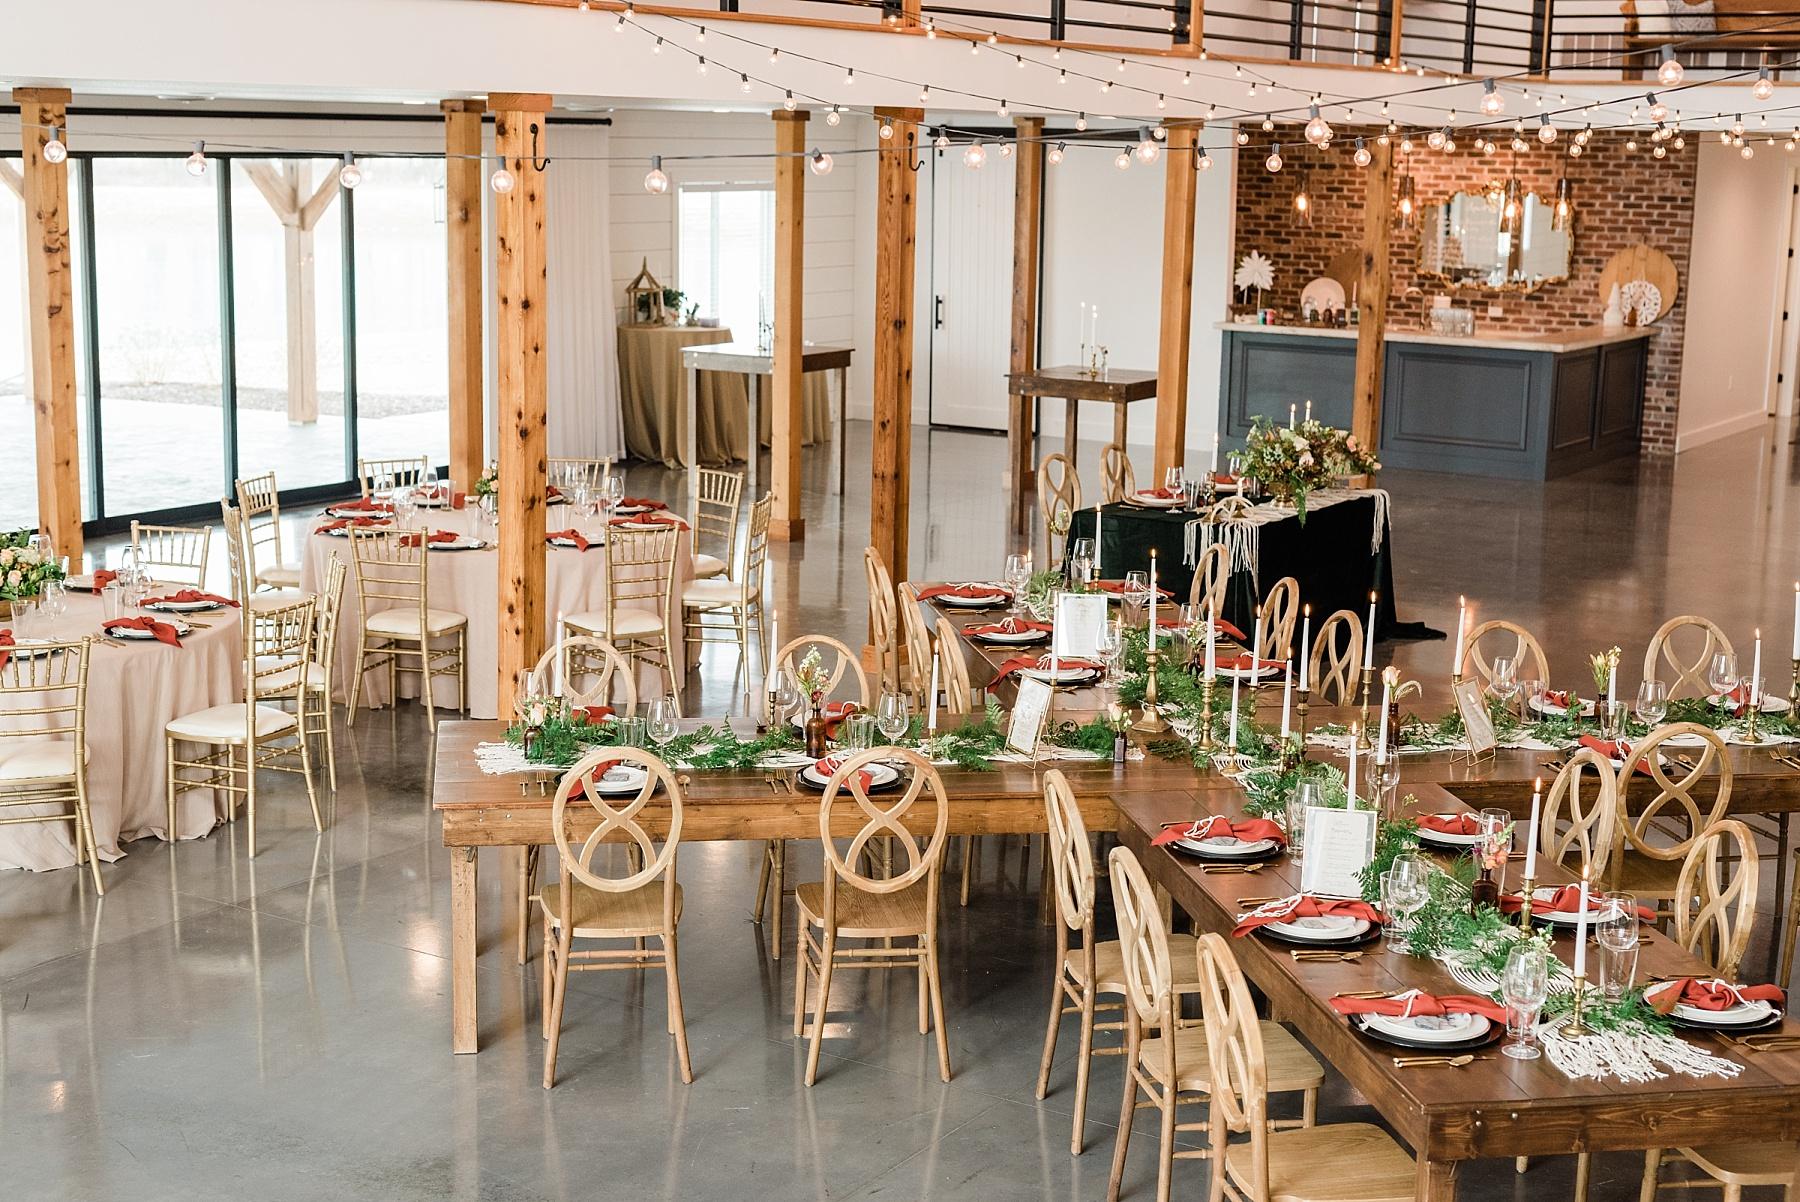 Eclectic Scandinavian Winter Wedding in All White Venue Emerson Fields by Kelsi Kliethermes Photography Best Missouri and Maui Wedding Photographer_0030.jpg